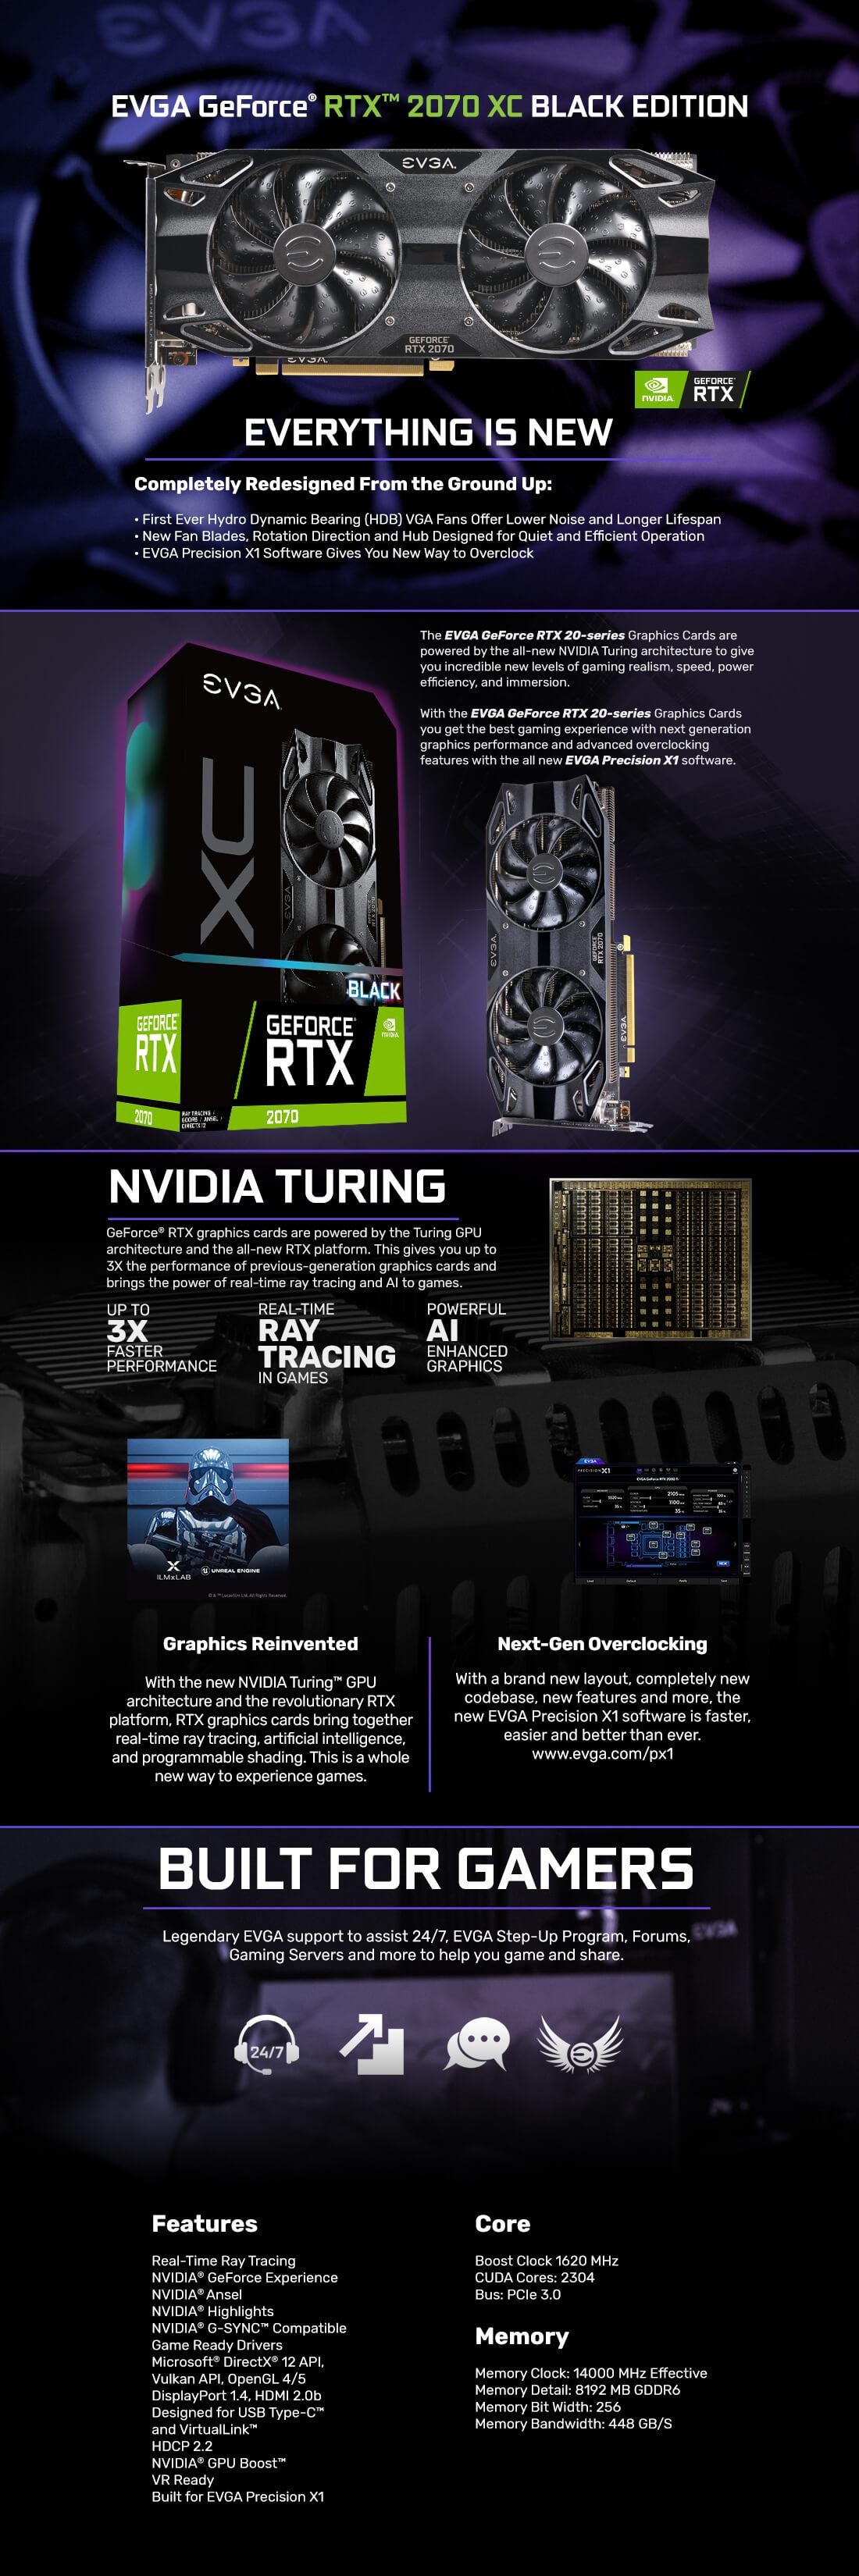 GeForce RTX™ 2070 XC BLACK EDITION GAMING, 1410 - 1620MHz, 8GB GDDR6,  Graphics Card